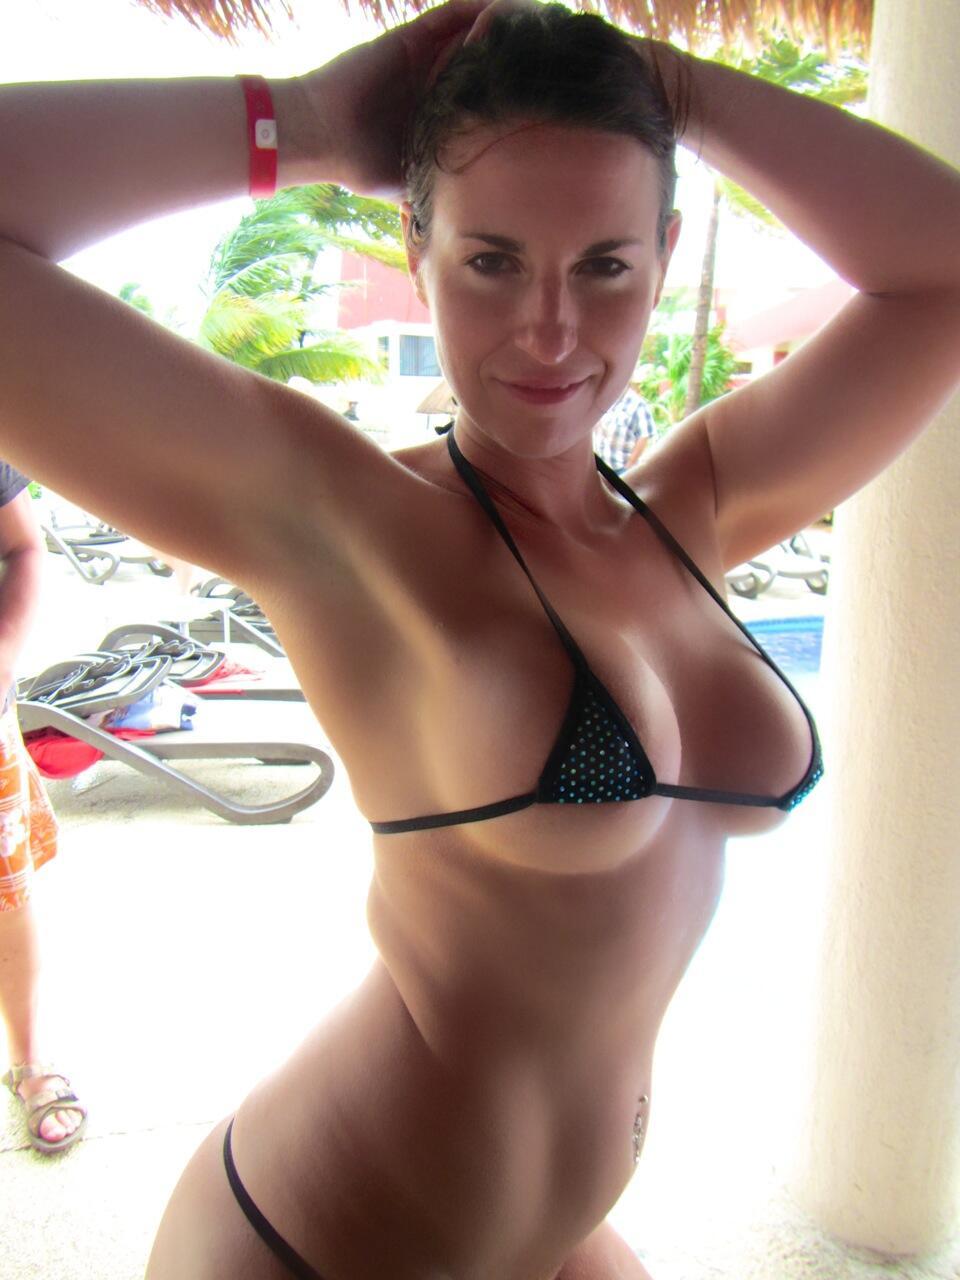 prereens in swimwear pic